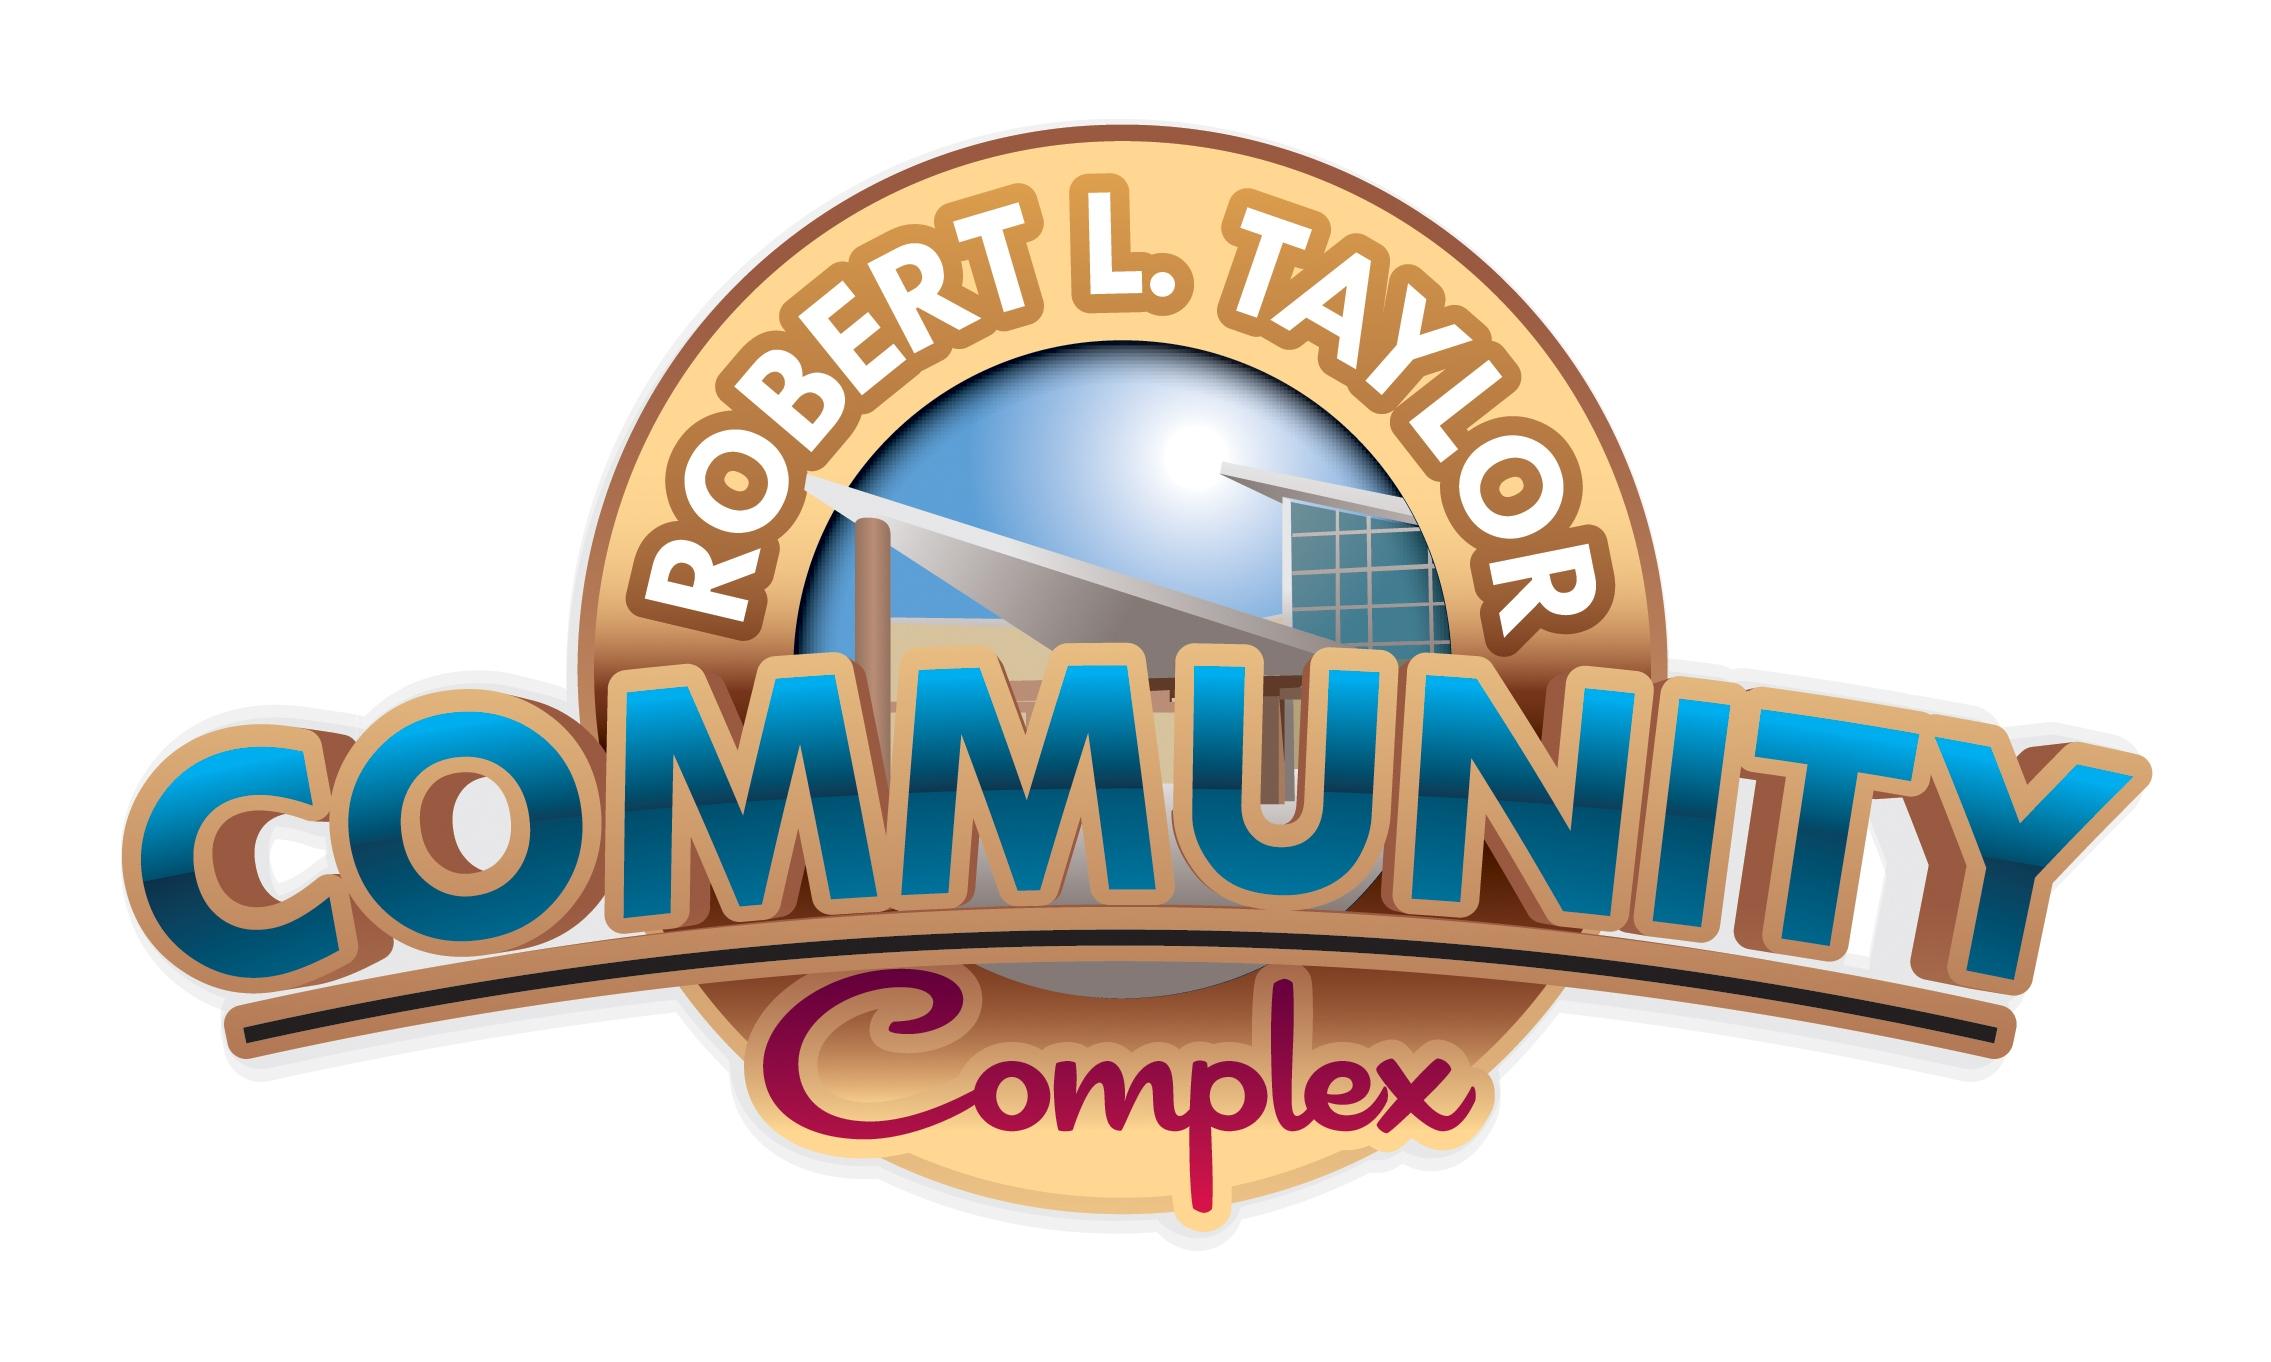 Robert Taylor CCenter